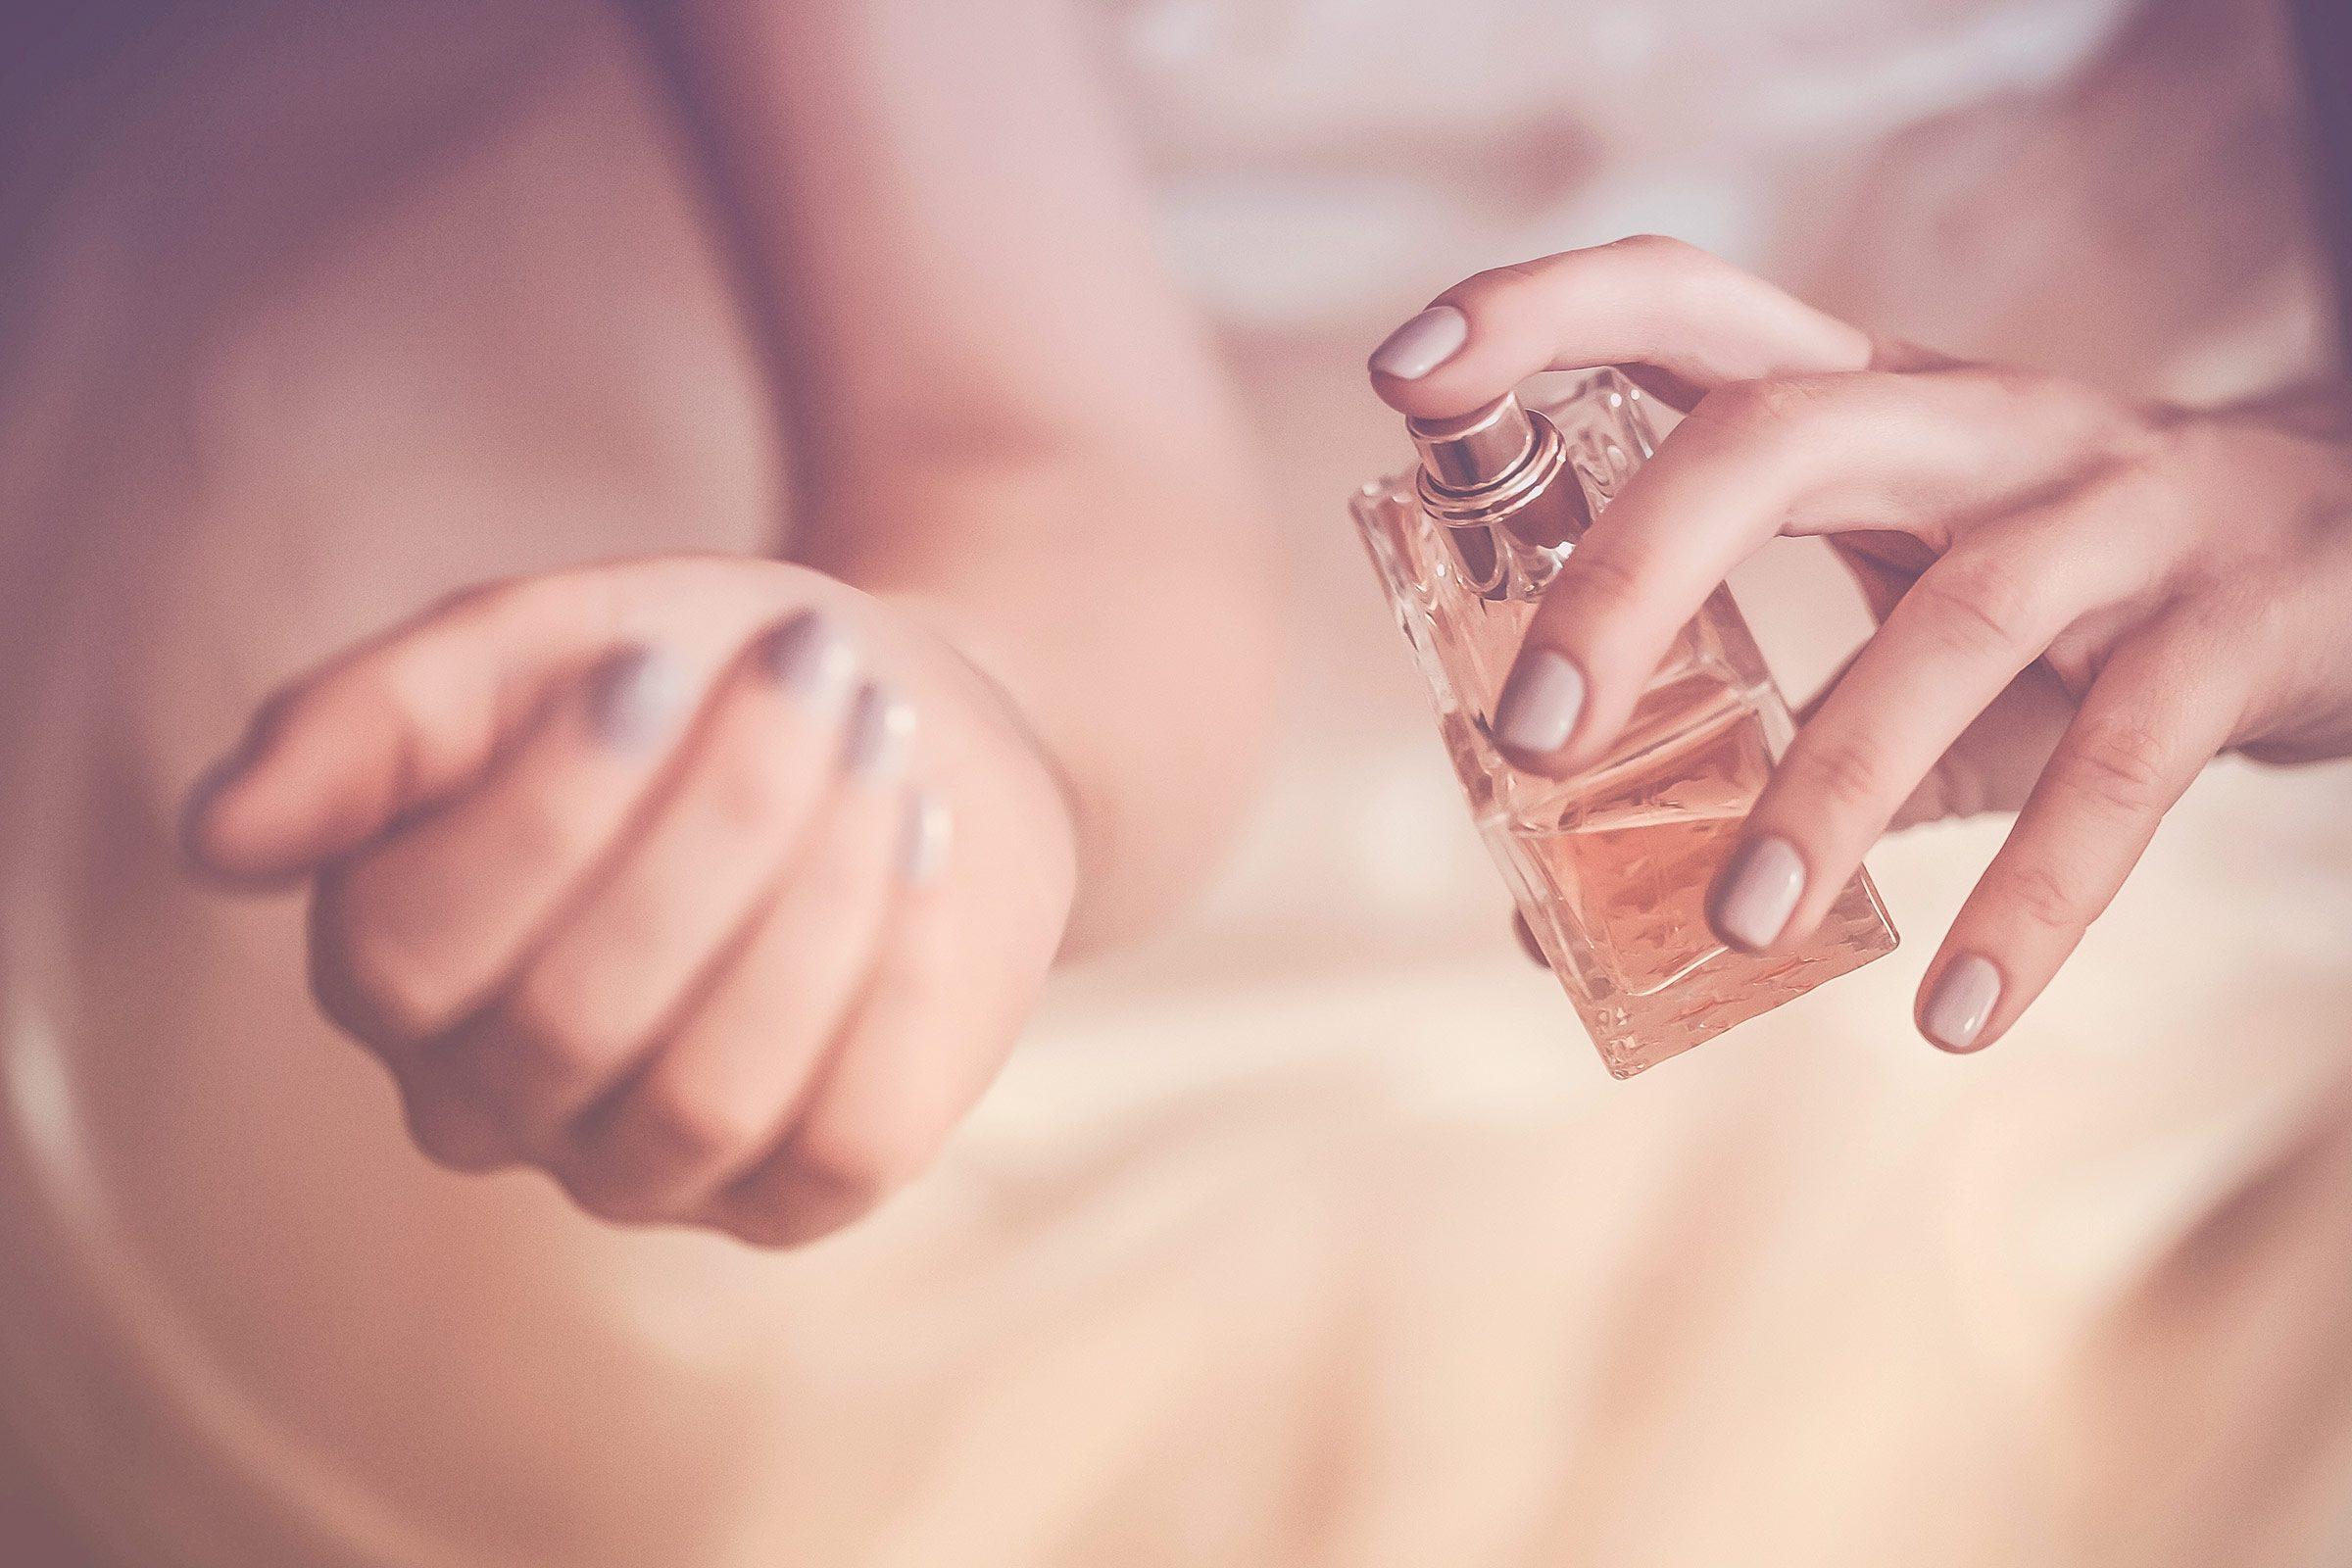 Overdoing the perfume: harmful.